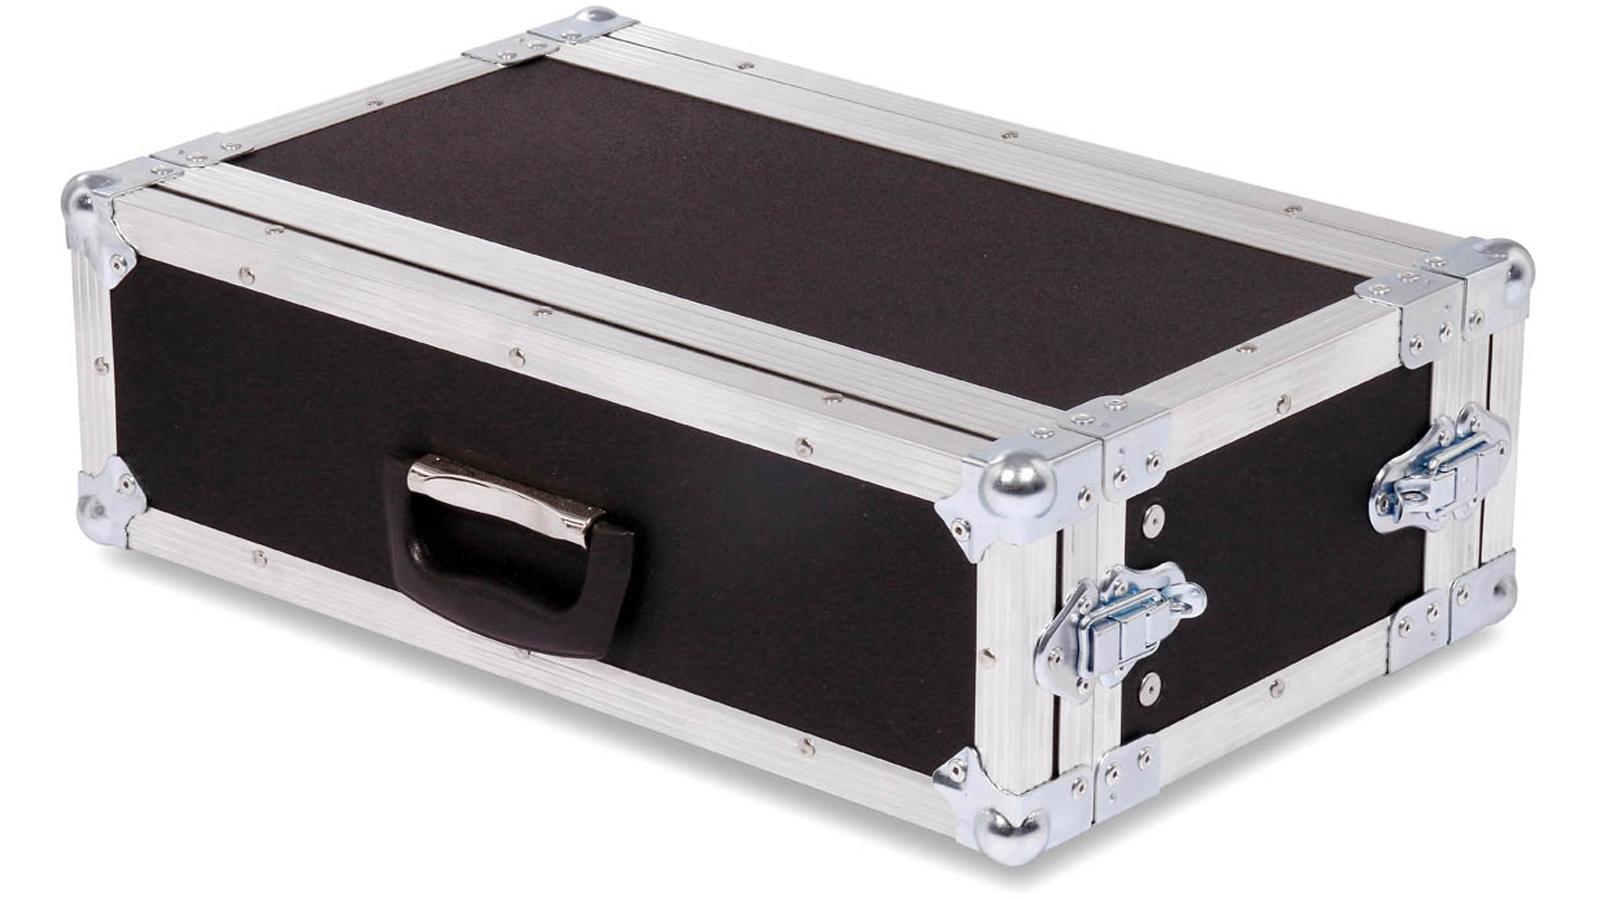 LT-Case 3 HE ECO II WK Compact Rack 23 cm 6372